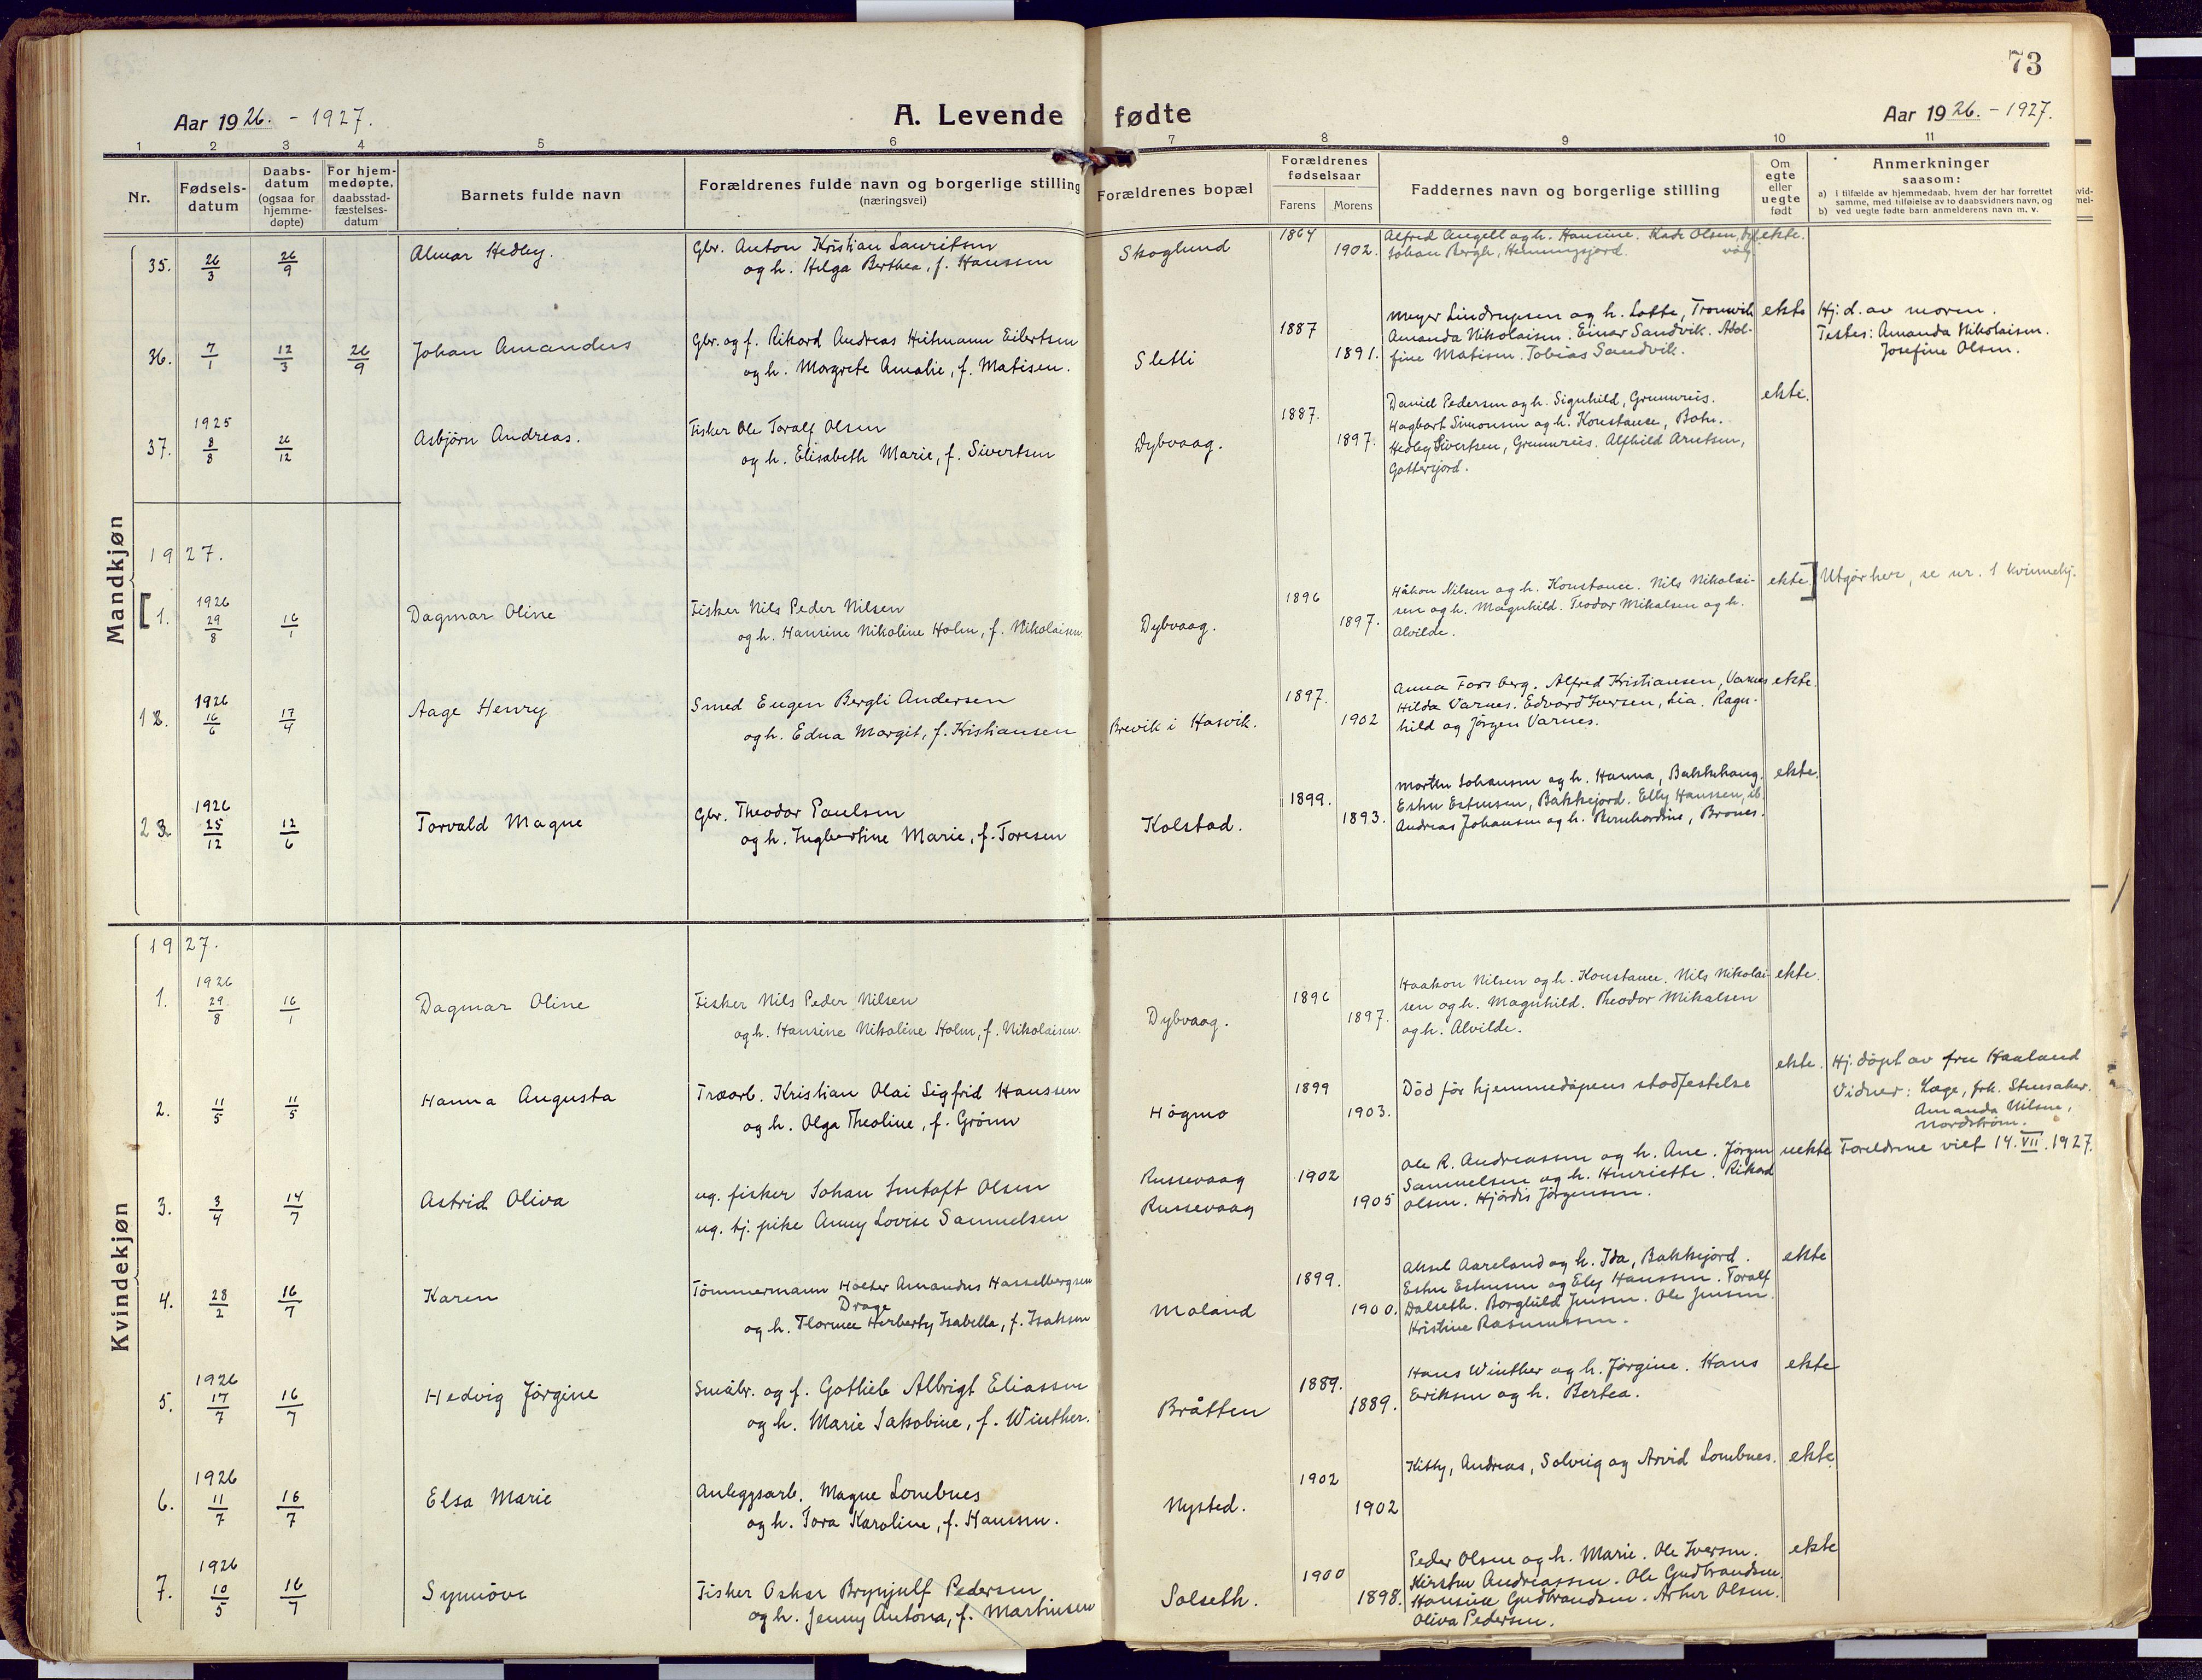 SATØ, Tranøy sokneprestkontor, I/Ia/Iaa/L0015kirke: Ministerialbok nr. 15, 1919-1928, s. 73